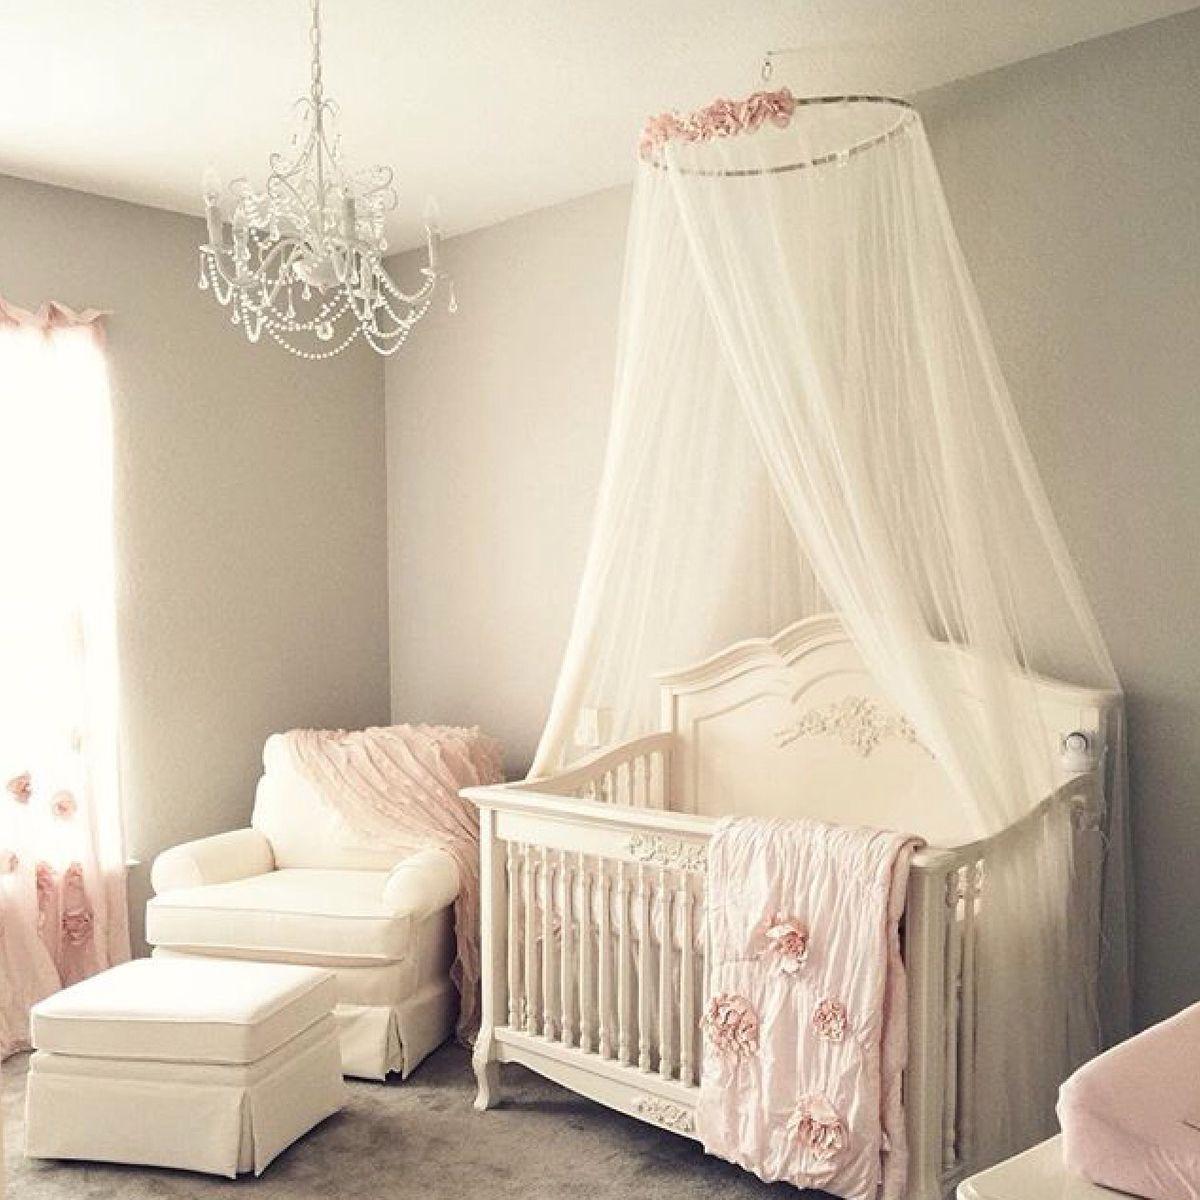 Blush Nursery With Neutral Textures: Girl Nursery, Blush Nursery, Baby Bedroom